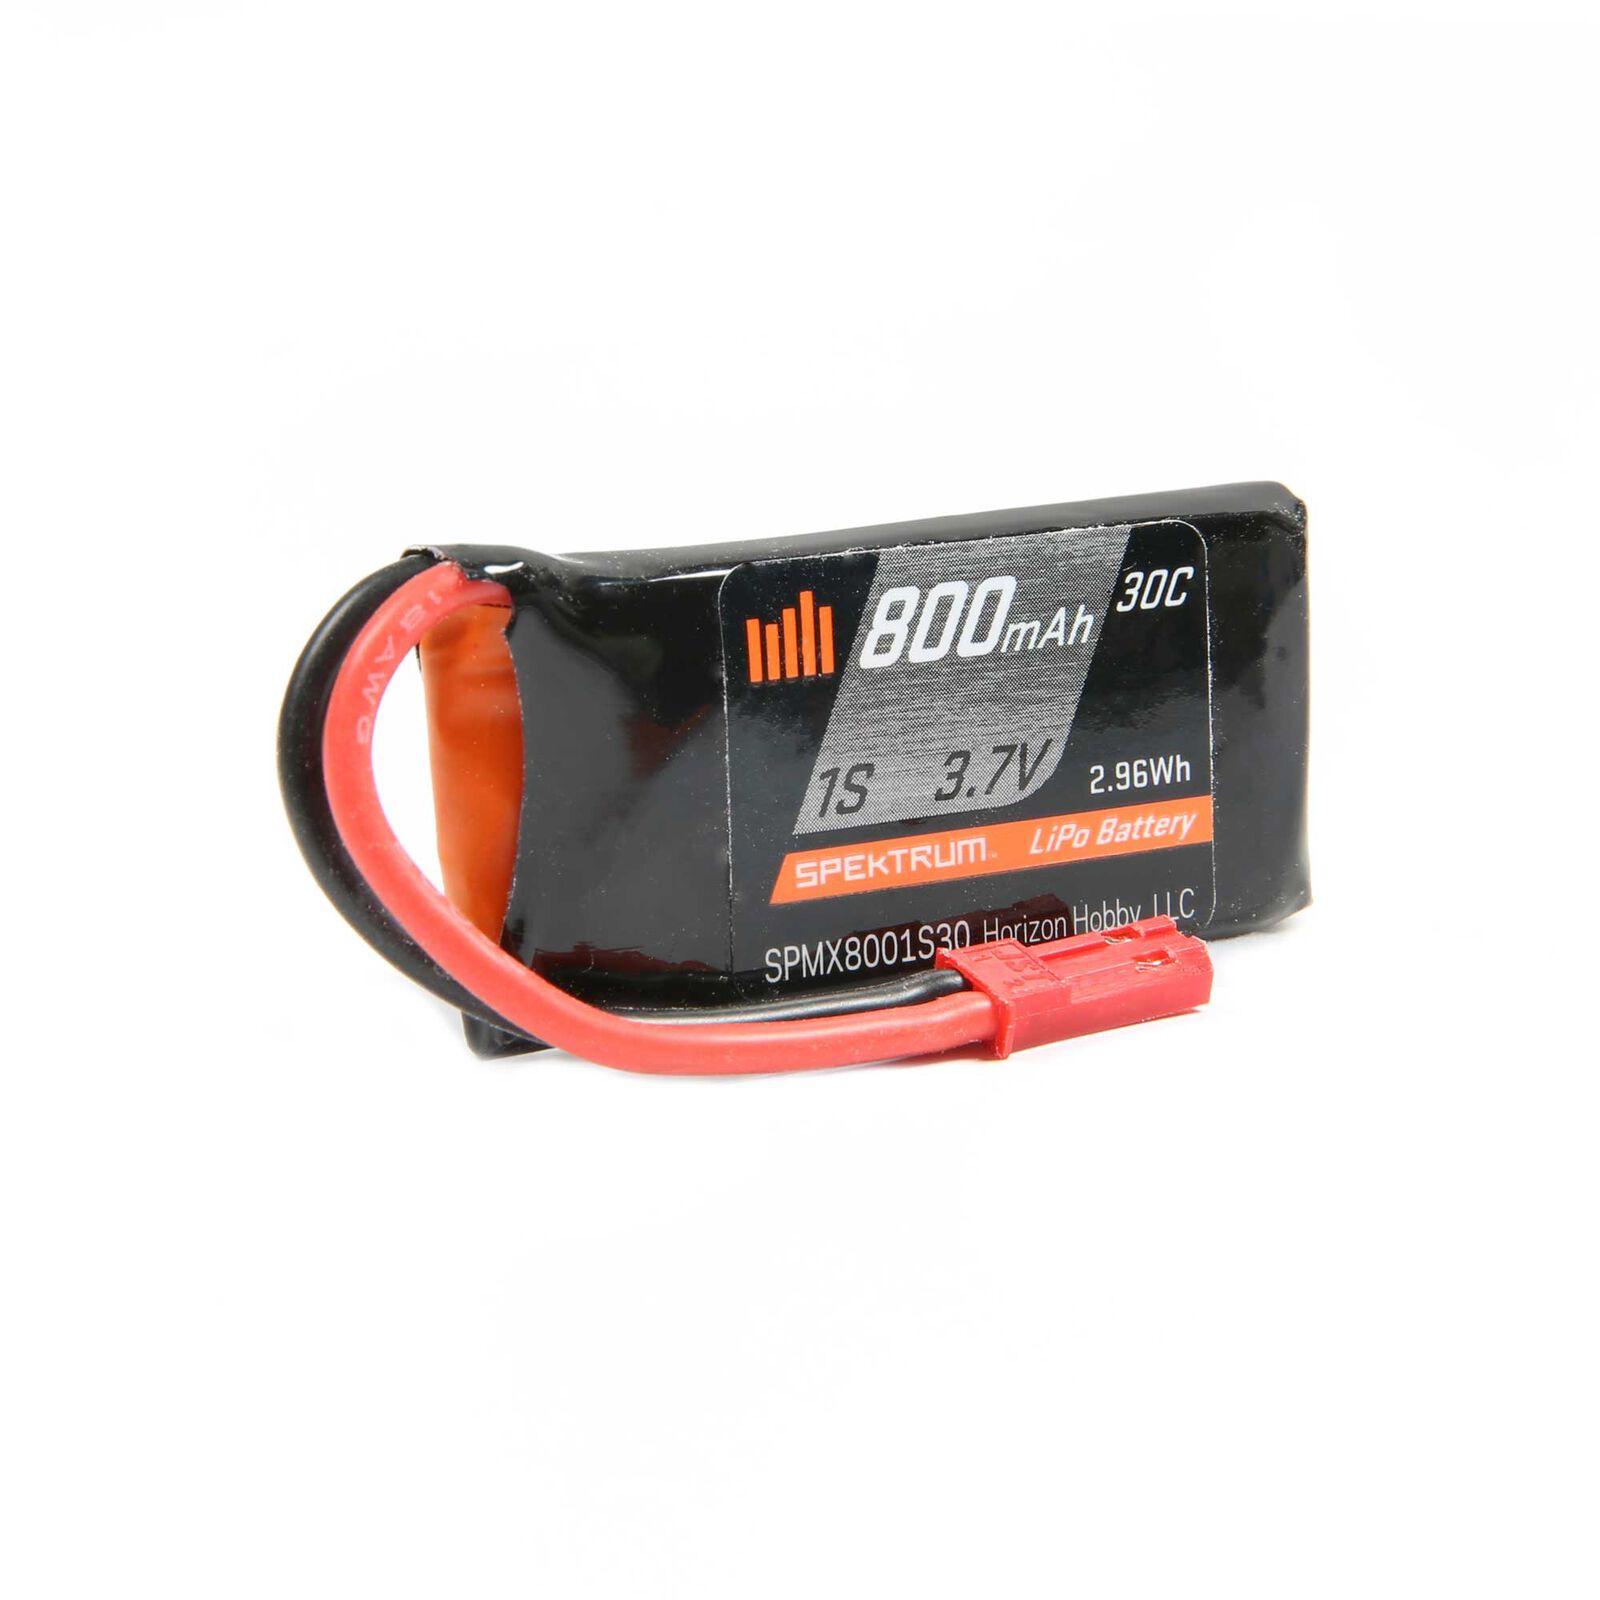 800mAh 1S 3.7V 30C LiPo Battery, JST